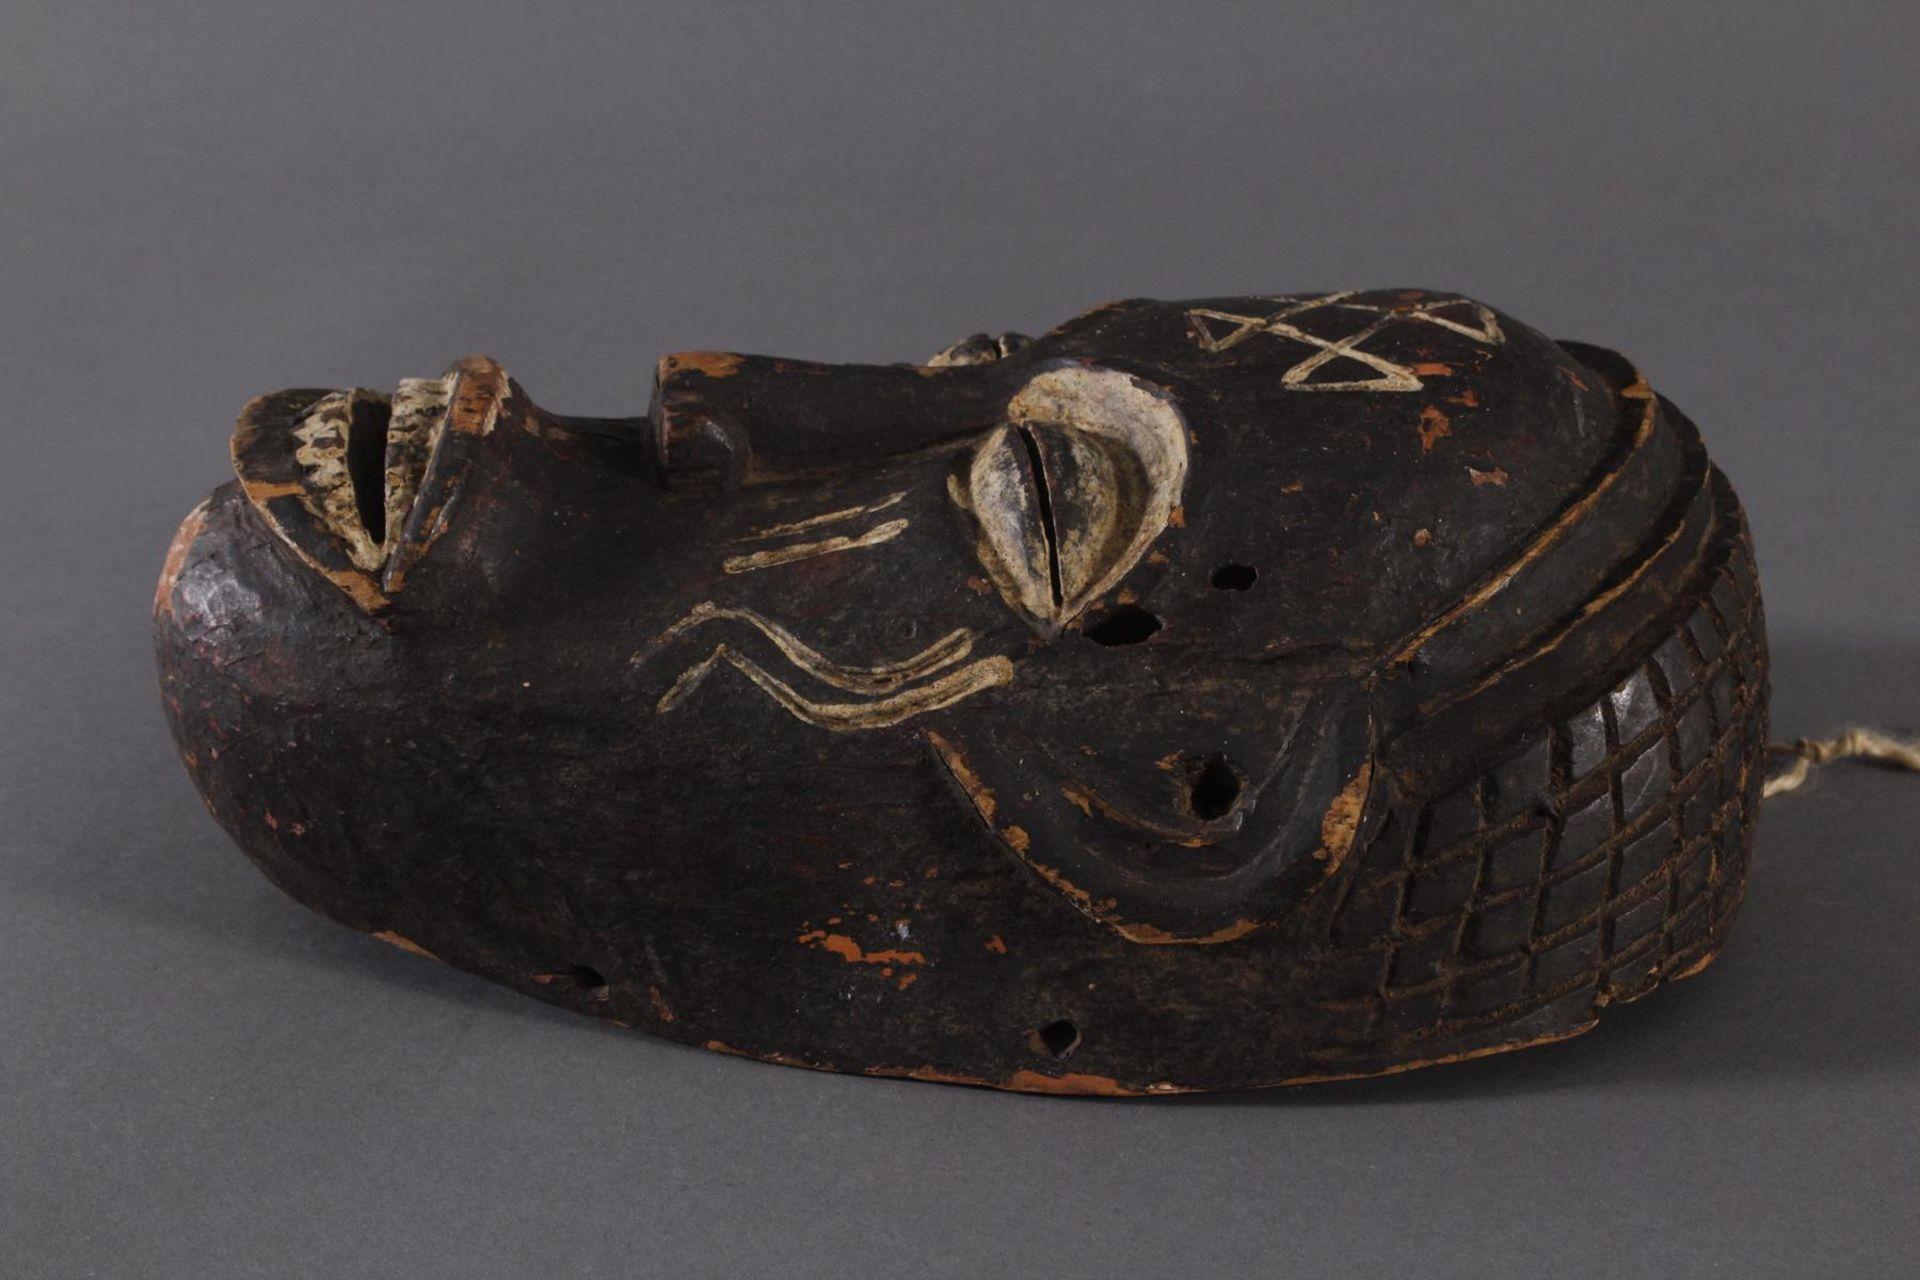 Antike Maske, Chokwe, Angola 1. Hälfte 20. Jh.Holz geschnitzt, dunkle Patina und Kaolin Bemalung, - Bild 3 aus 6